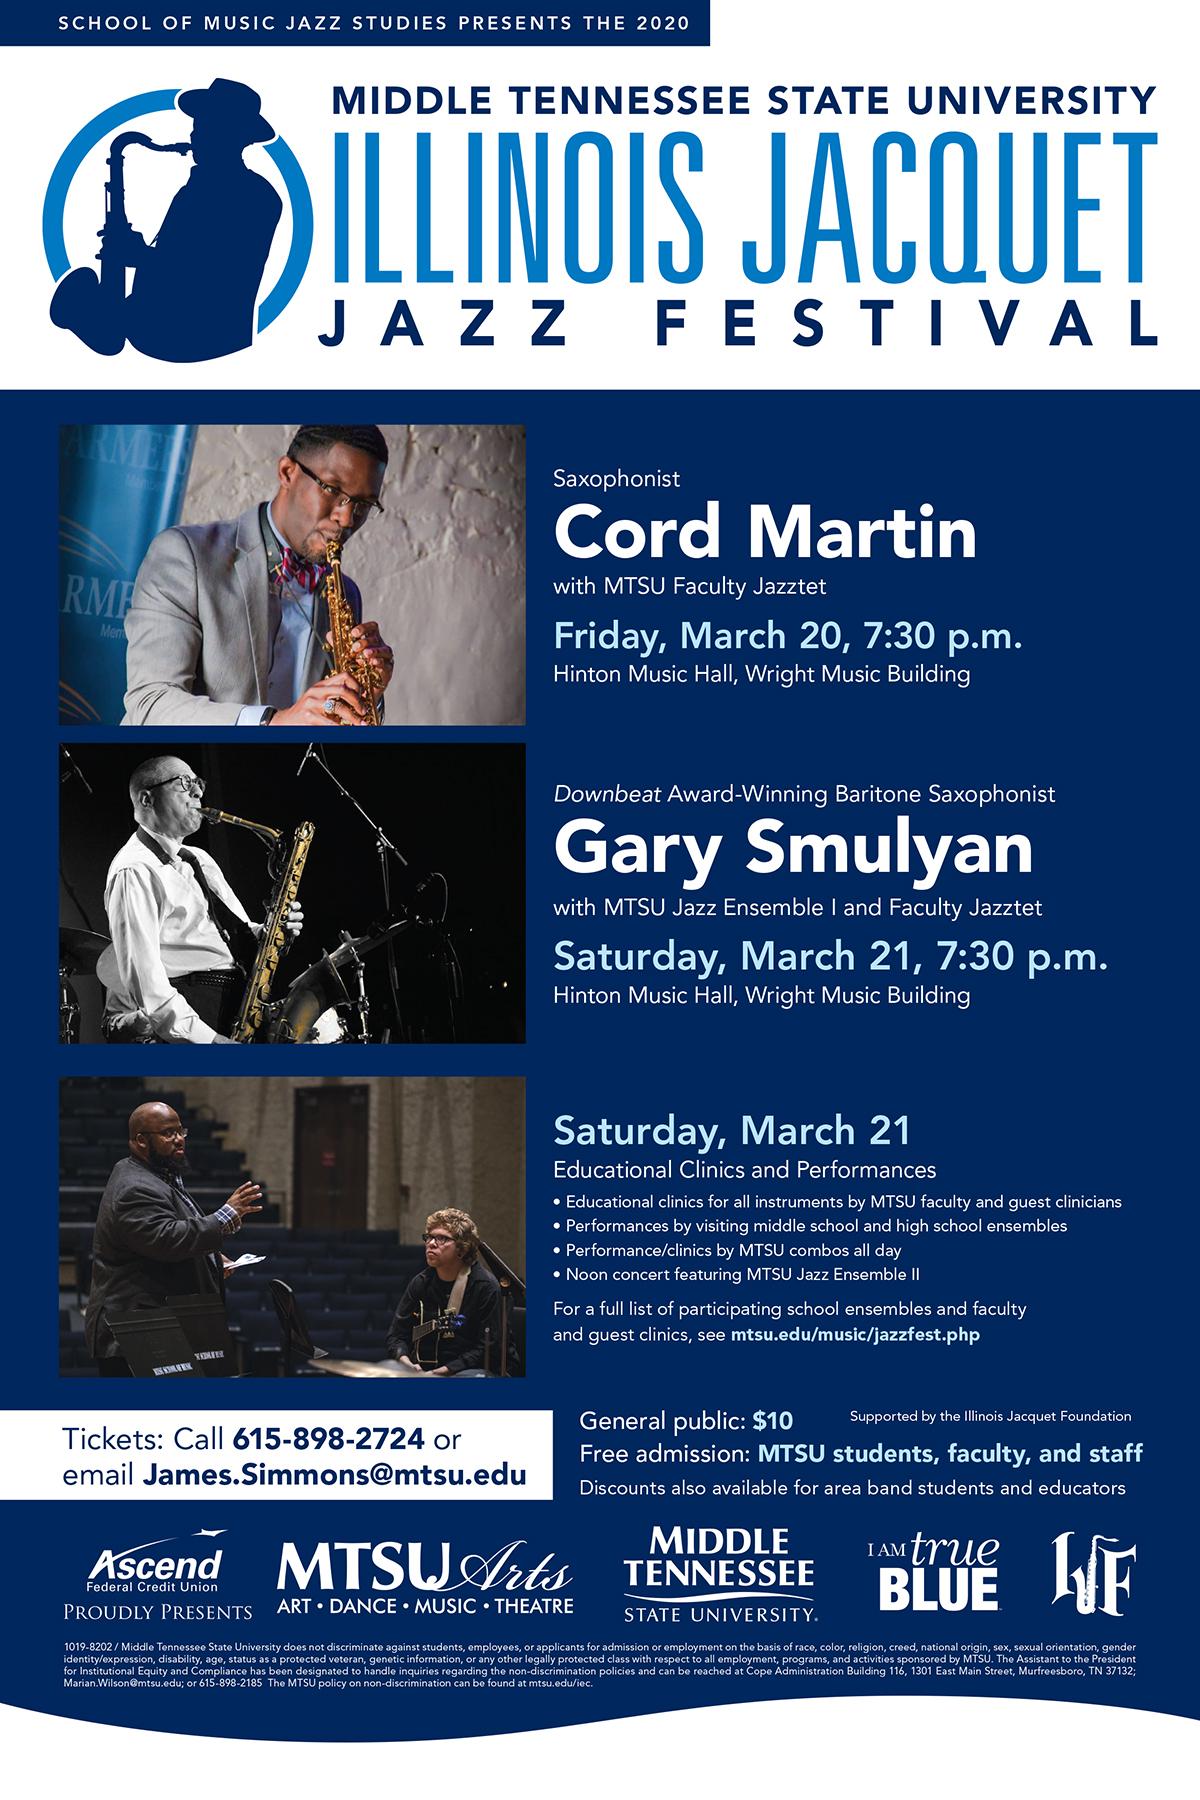 MTSU 2020 Illinois Jacquet Jazz Festival poster